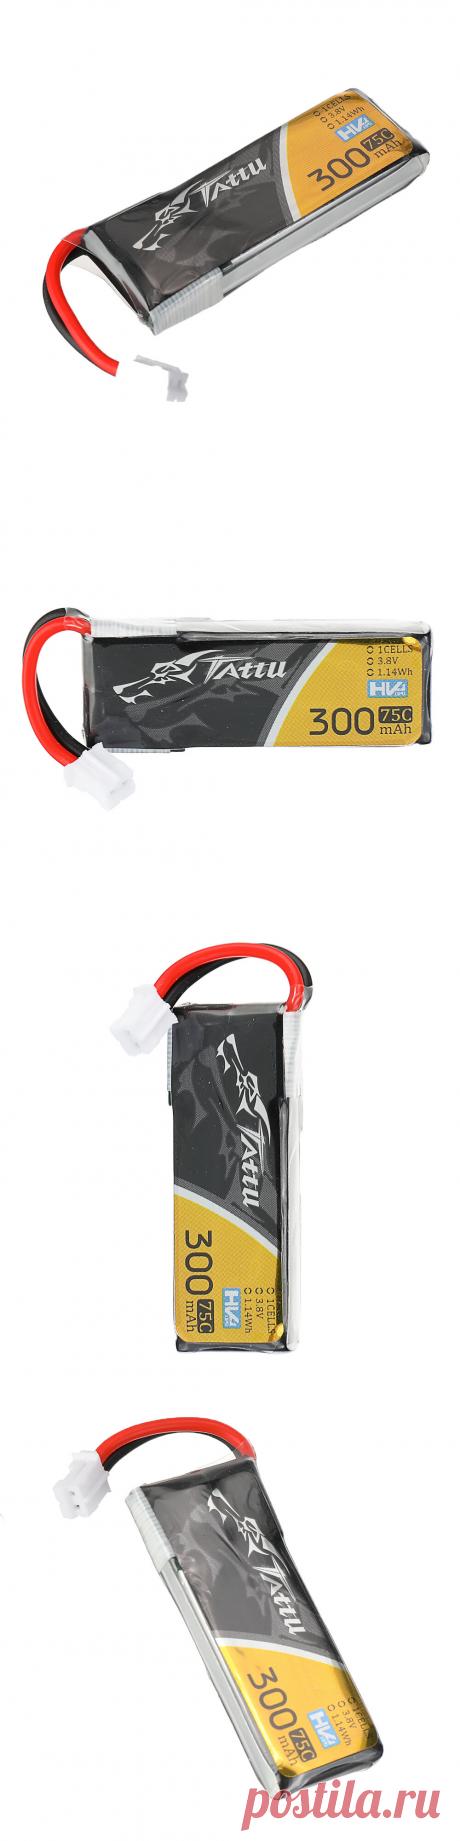 tattu 3.8v 300mah 75c 1s ph2.0 plug lipo battery for for happymodel mobula6 eachine trashcan snapper6 7 mobula7 Sale - Banggood.com